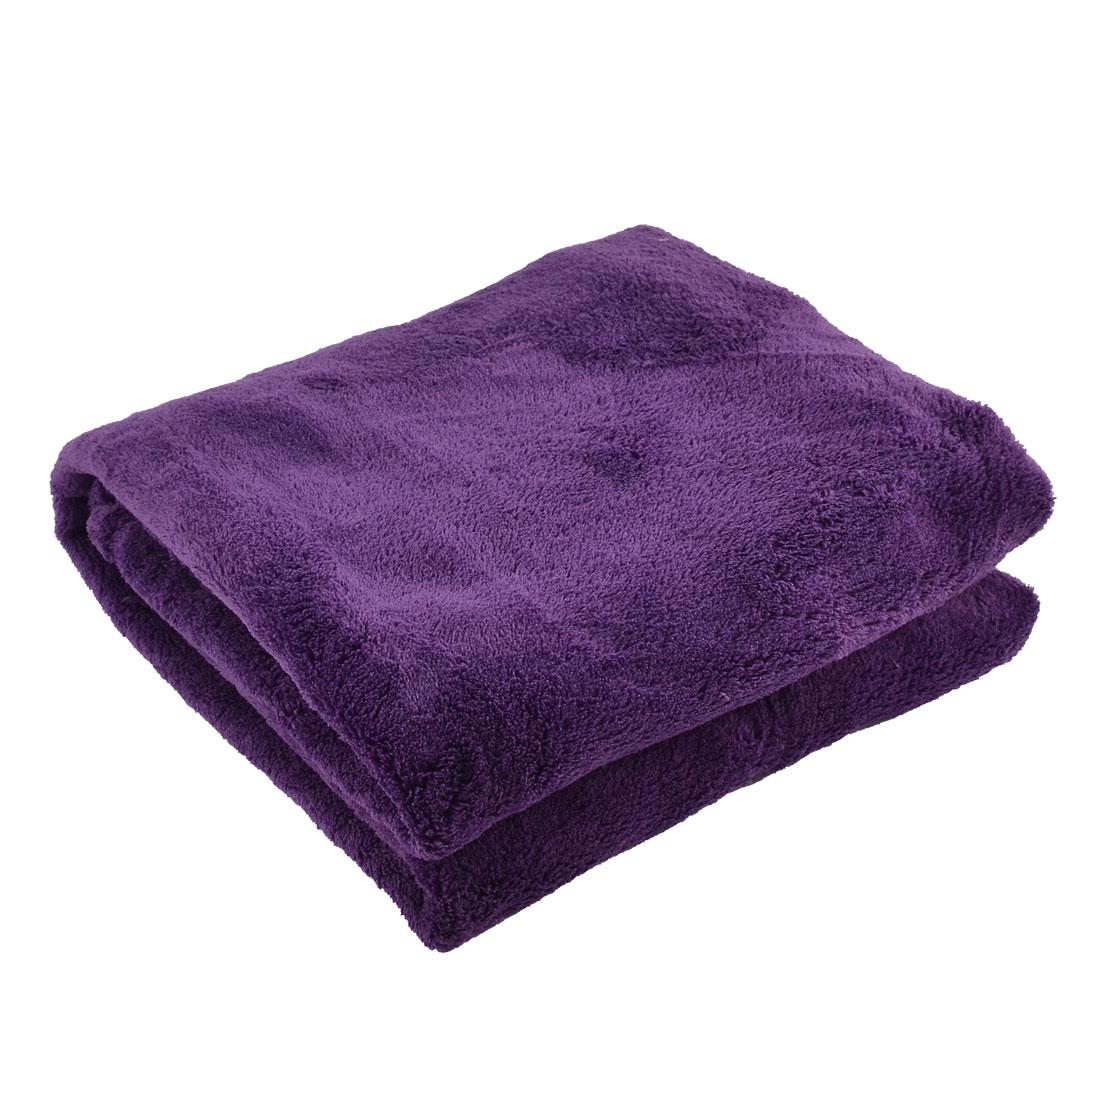 Home Bedroom Airplane Warm Soft Throw Pure Blanket Rug Plush Fleece Quilt Purple